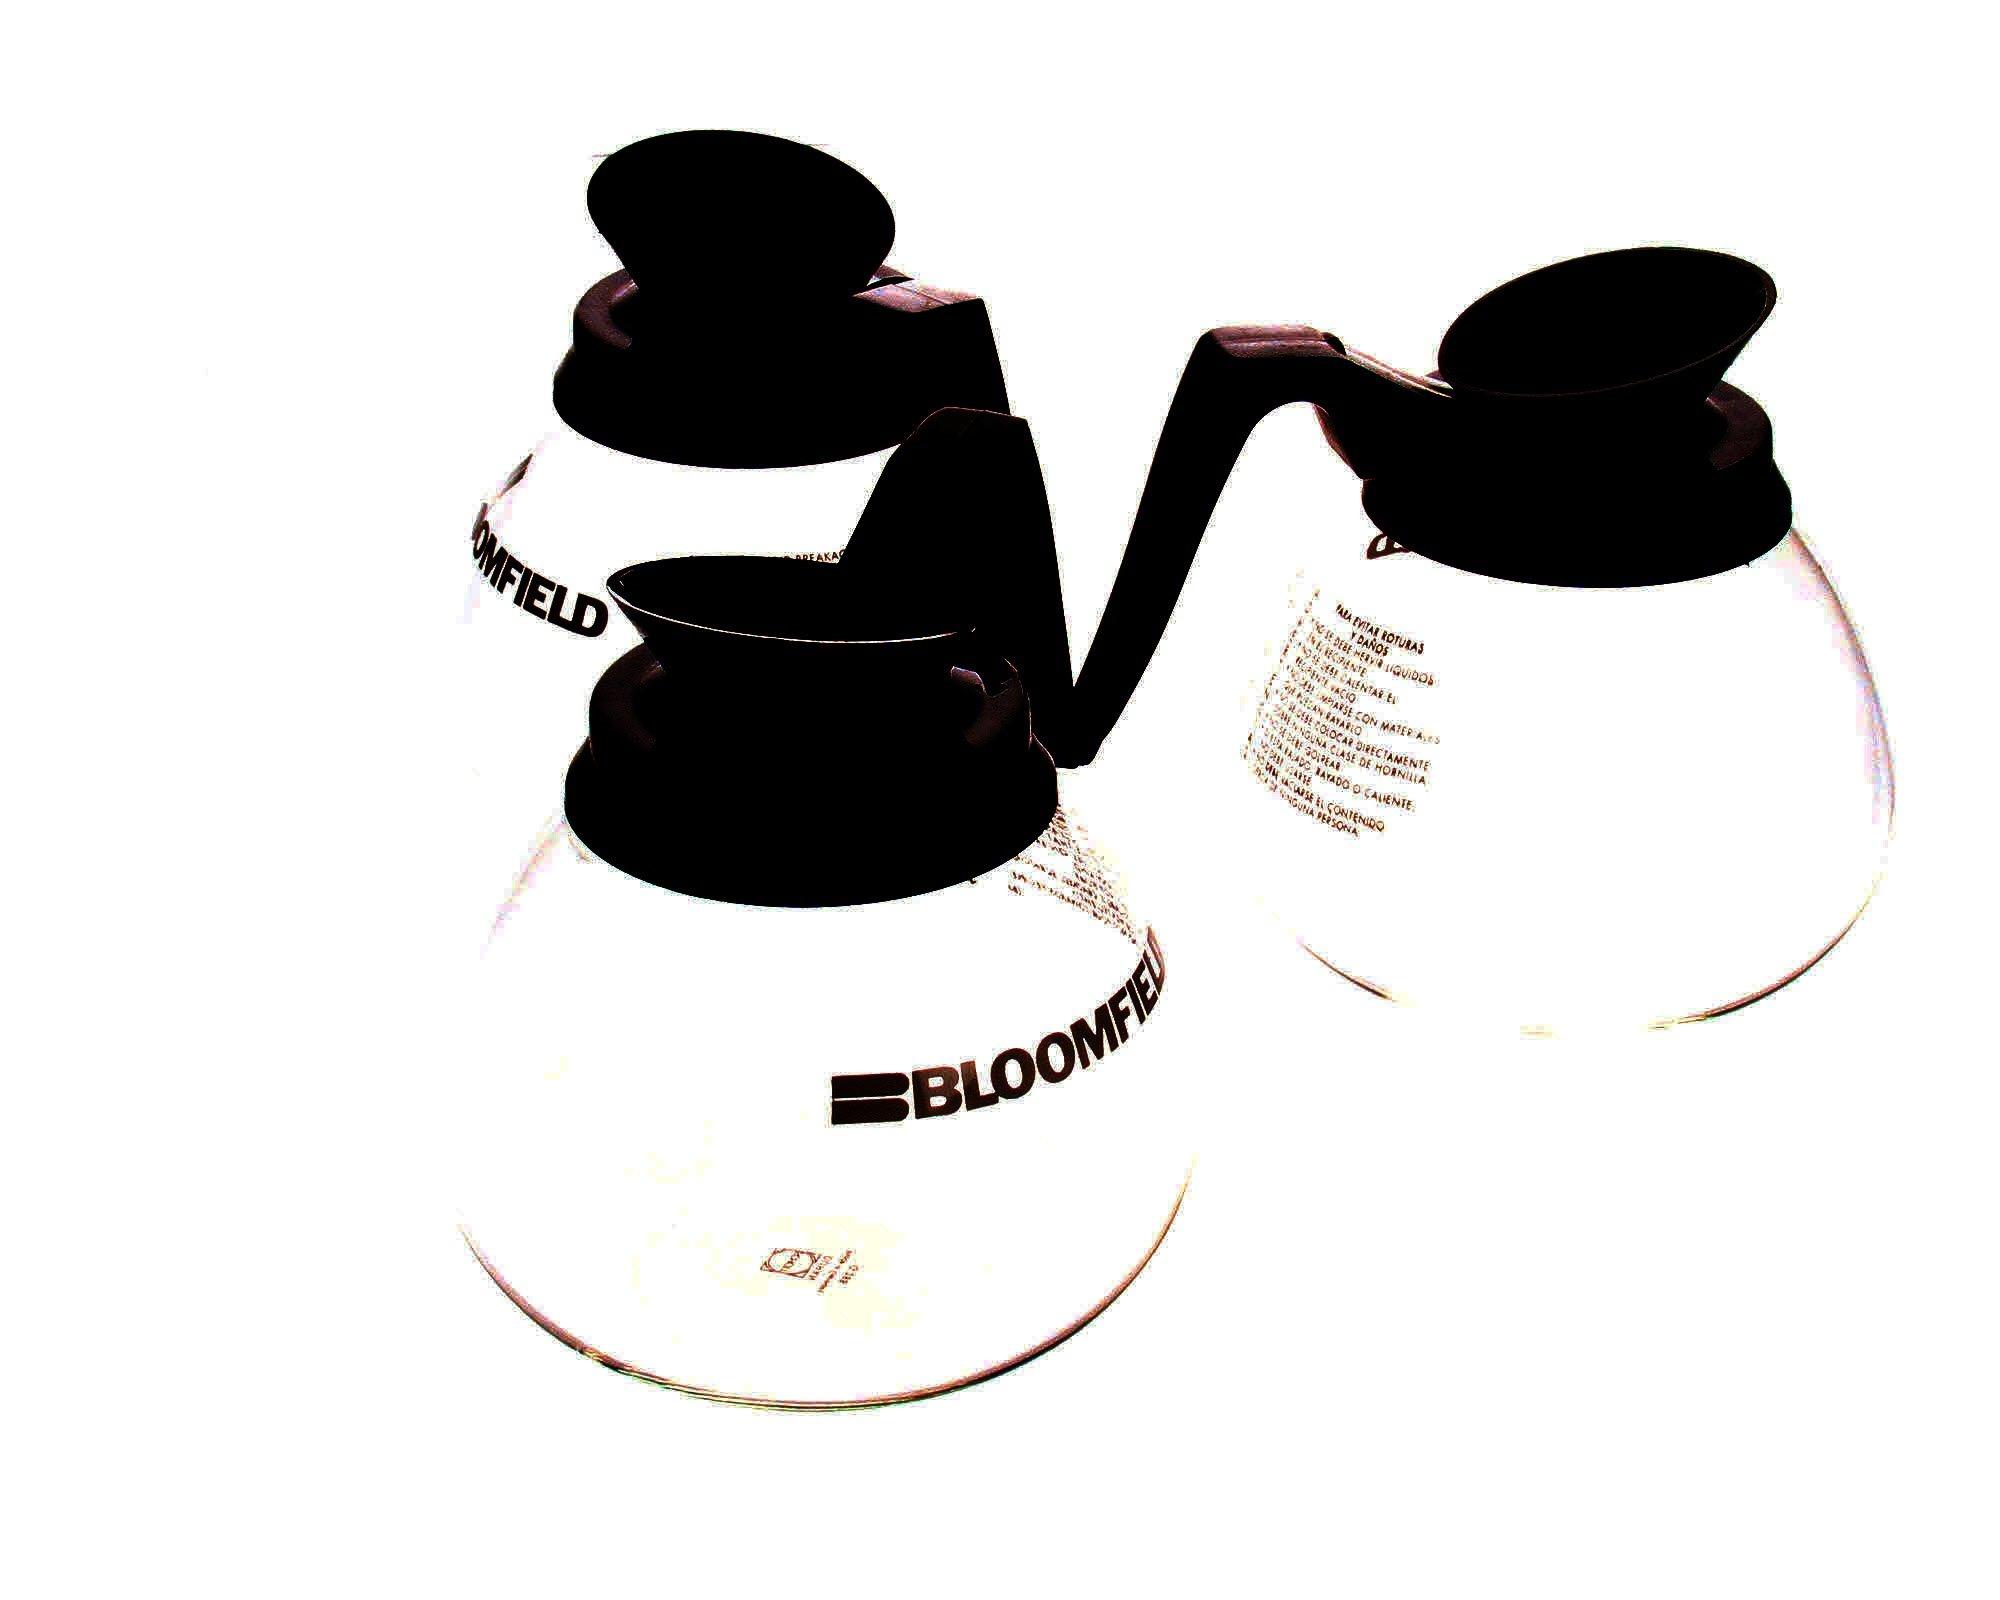 Bloomfield REG8903BL3, Decanter, W/Black Handle 3Pk by Bloomfield